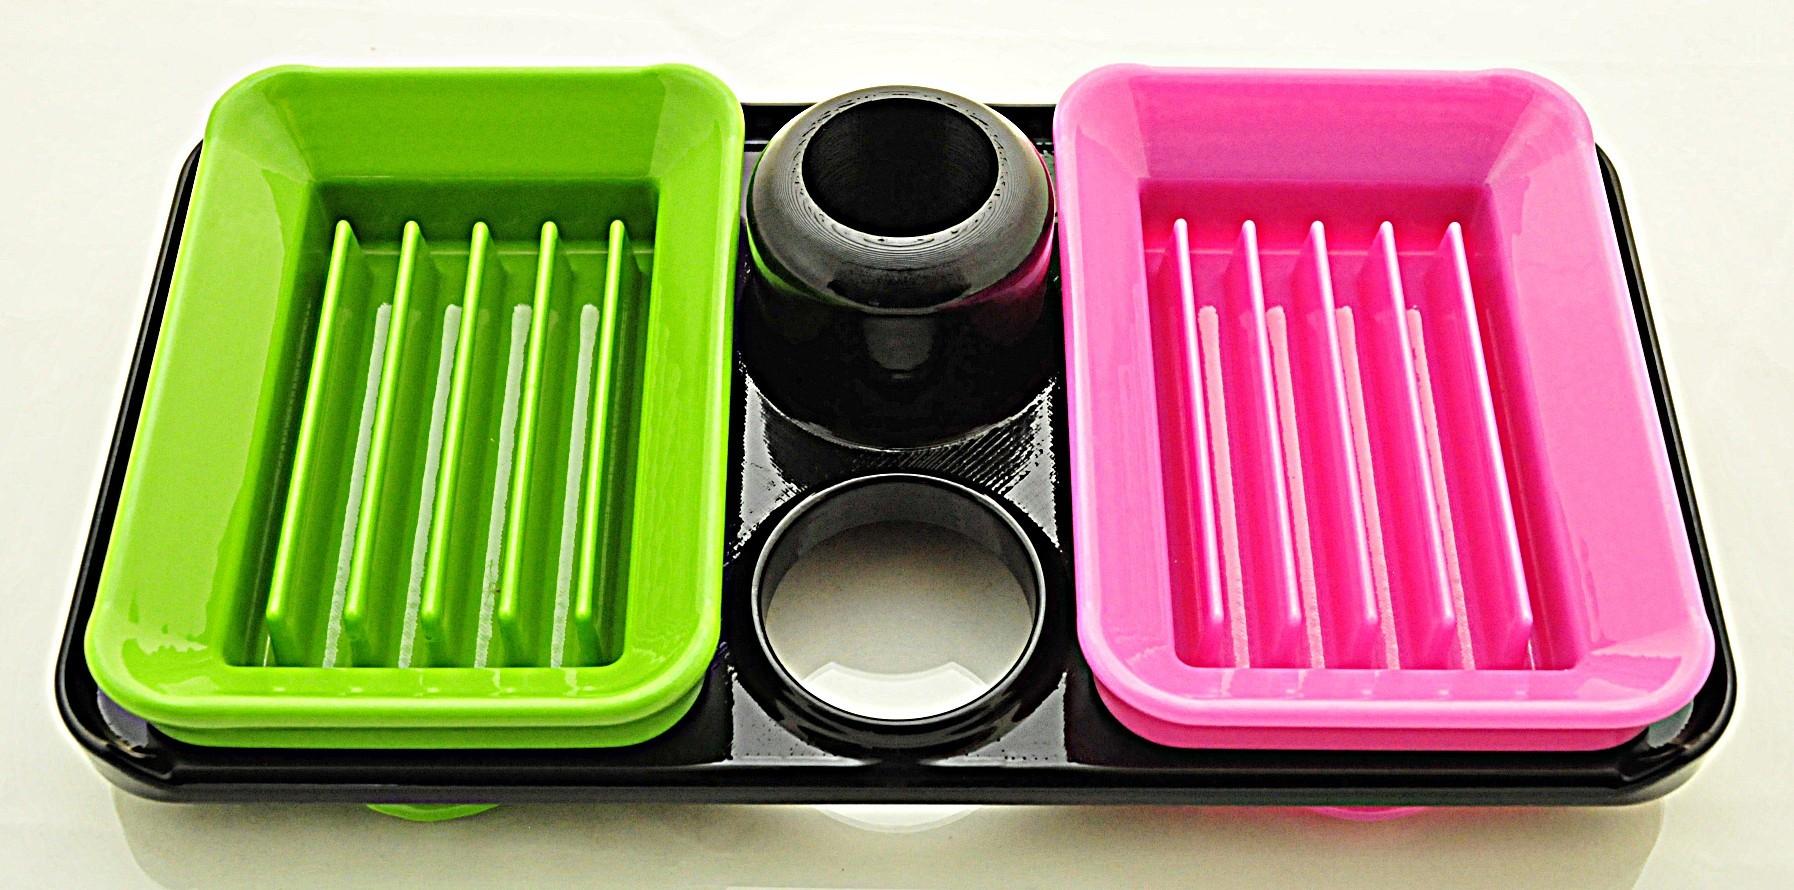 DishesAndTrayPolished.jpg Download free STL file  Interchangeable Shower Soap Dish System • Model to 3D print, Sue3DDesigns